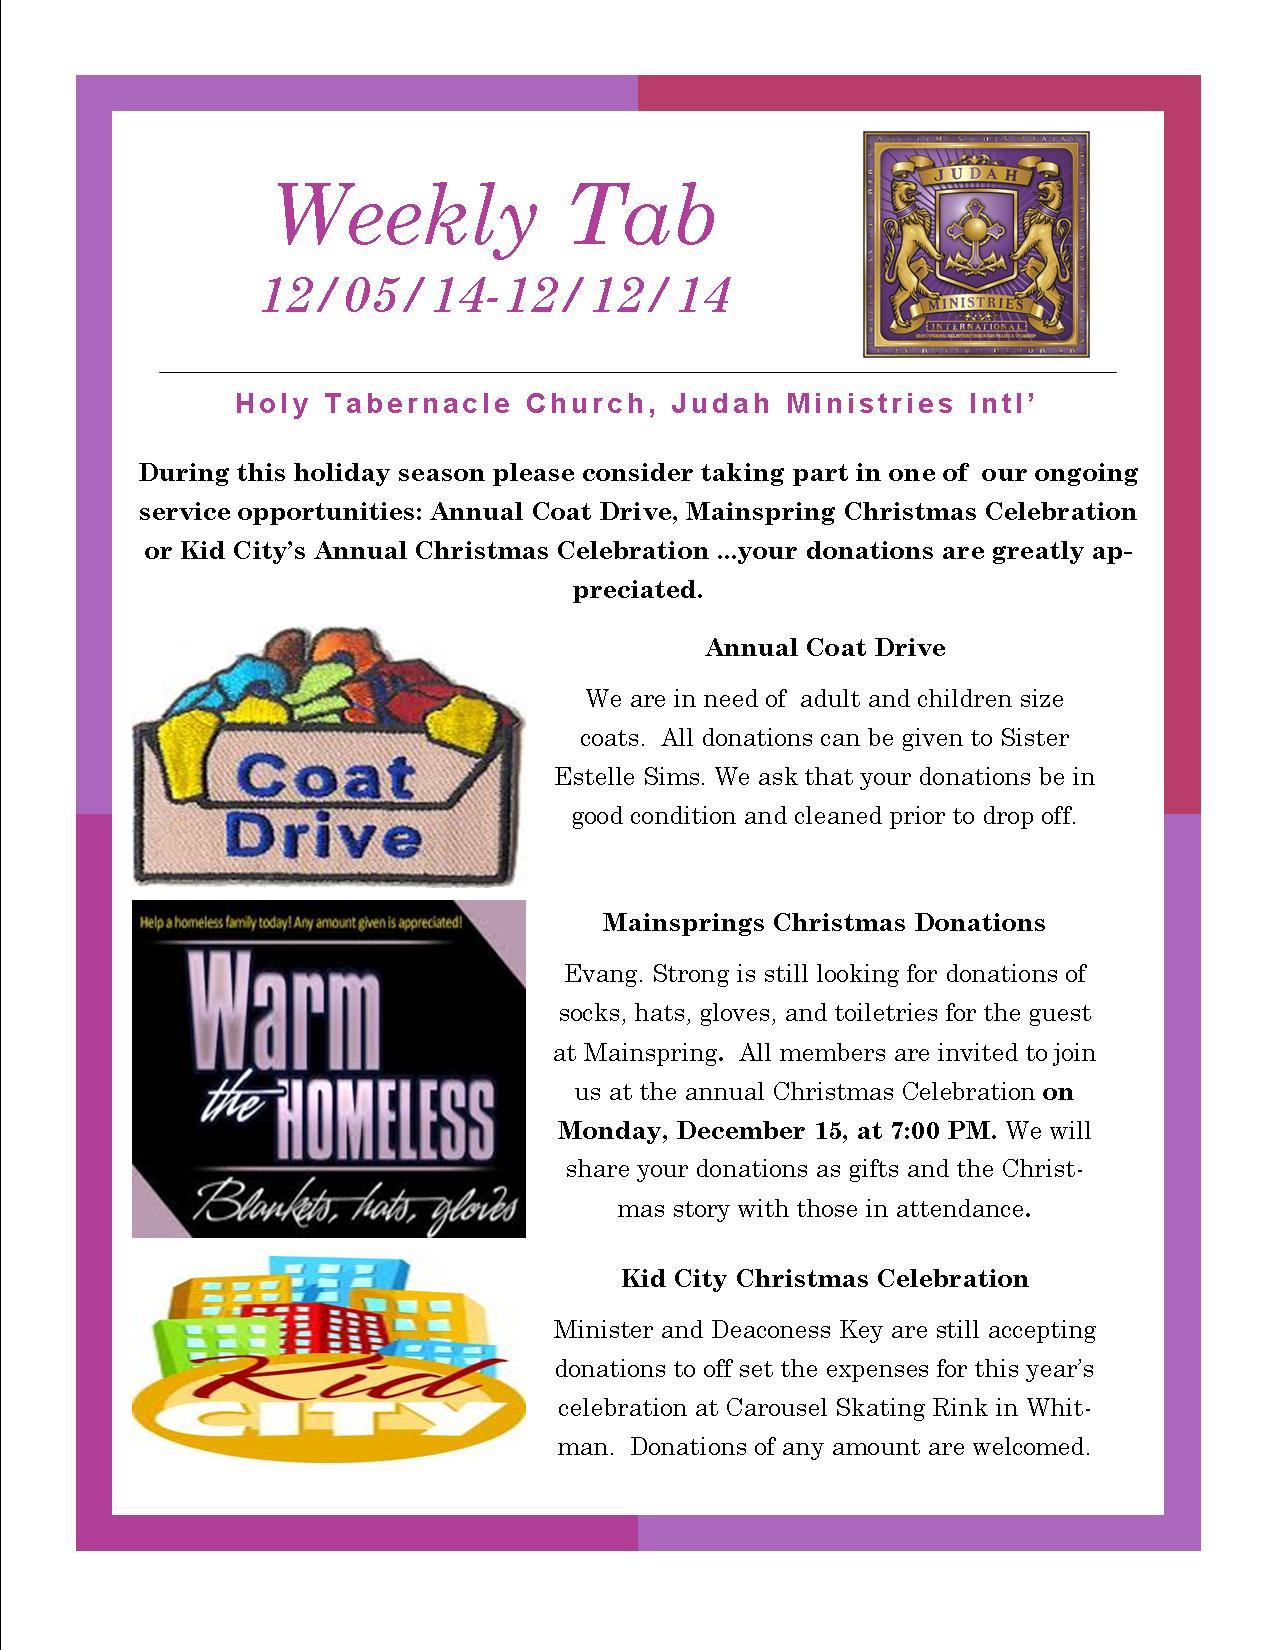 Weekly Tab 12.05.14 page 2